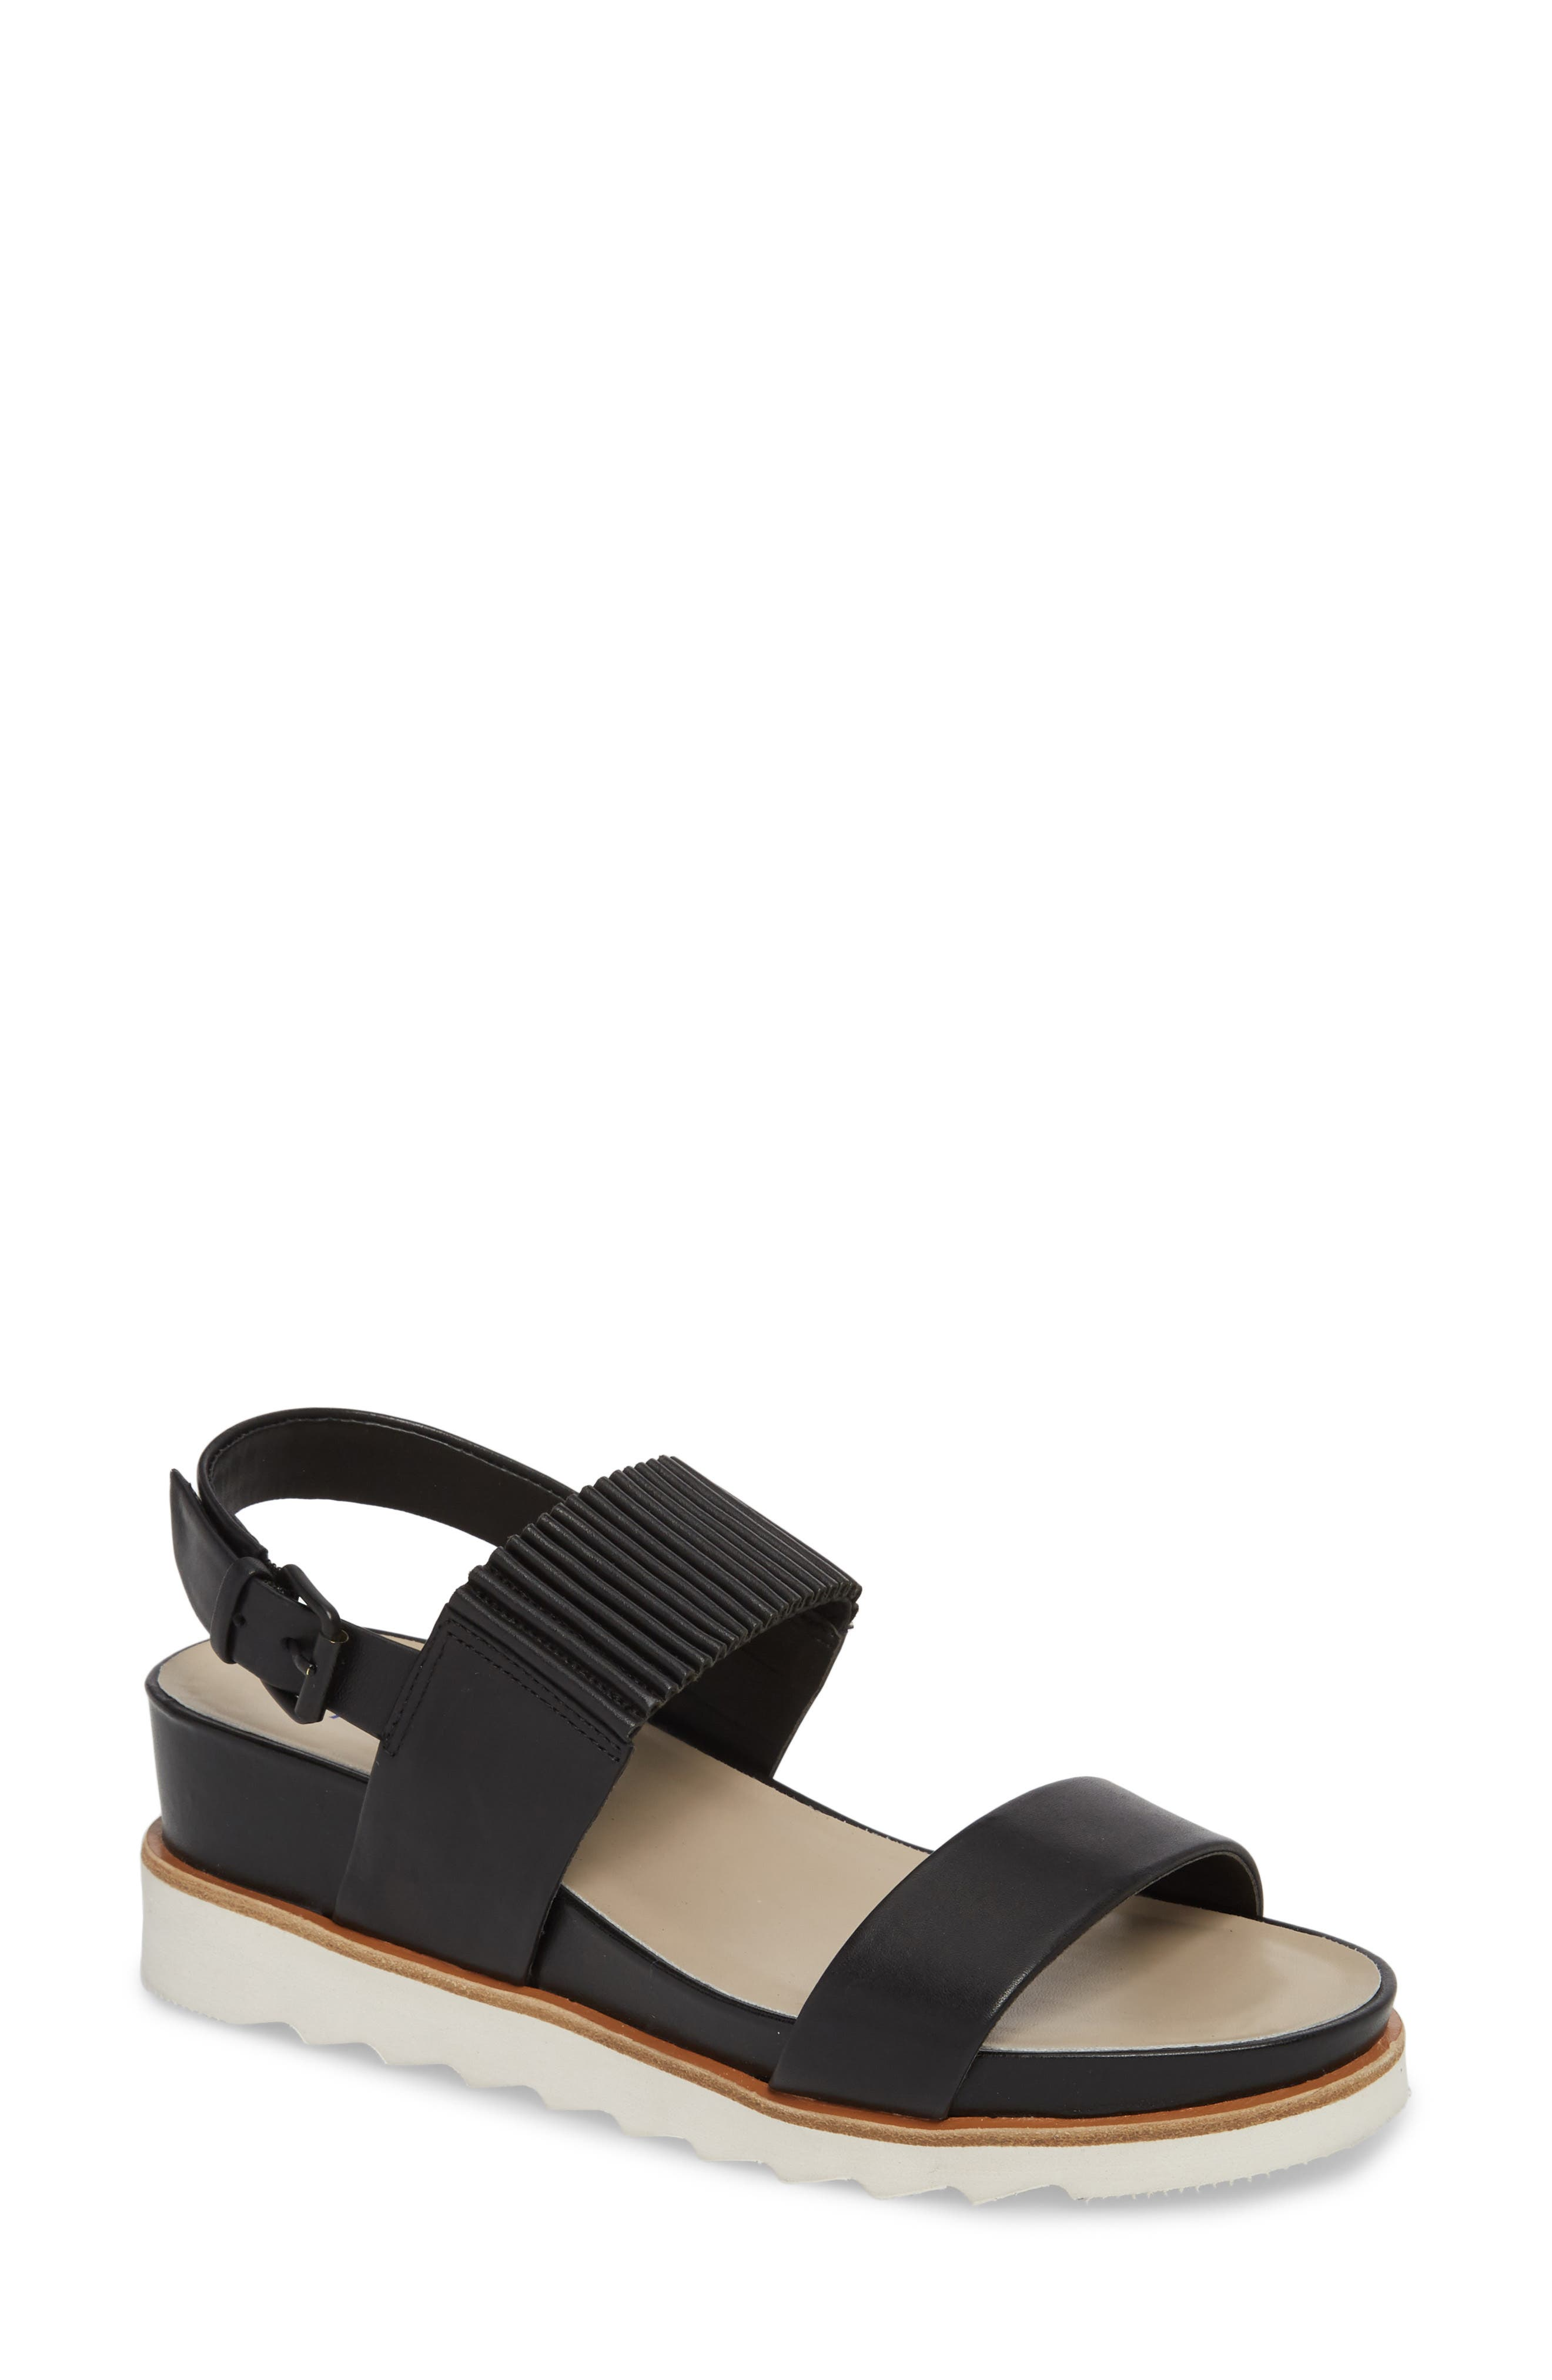 Grace Wedge Sandal,                         Main,                         color, BLACK LEATHER